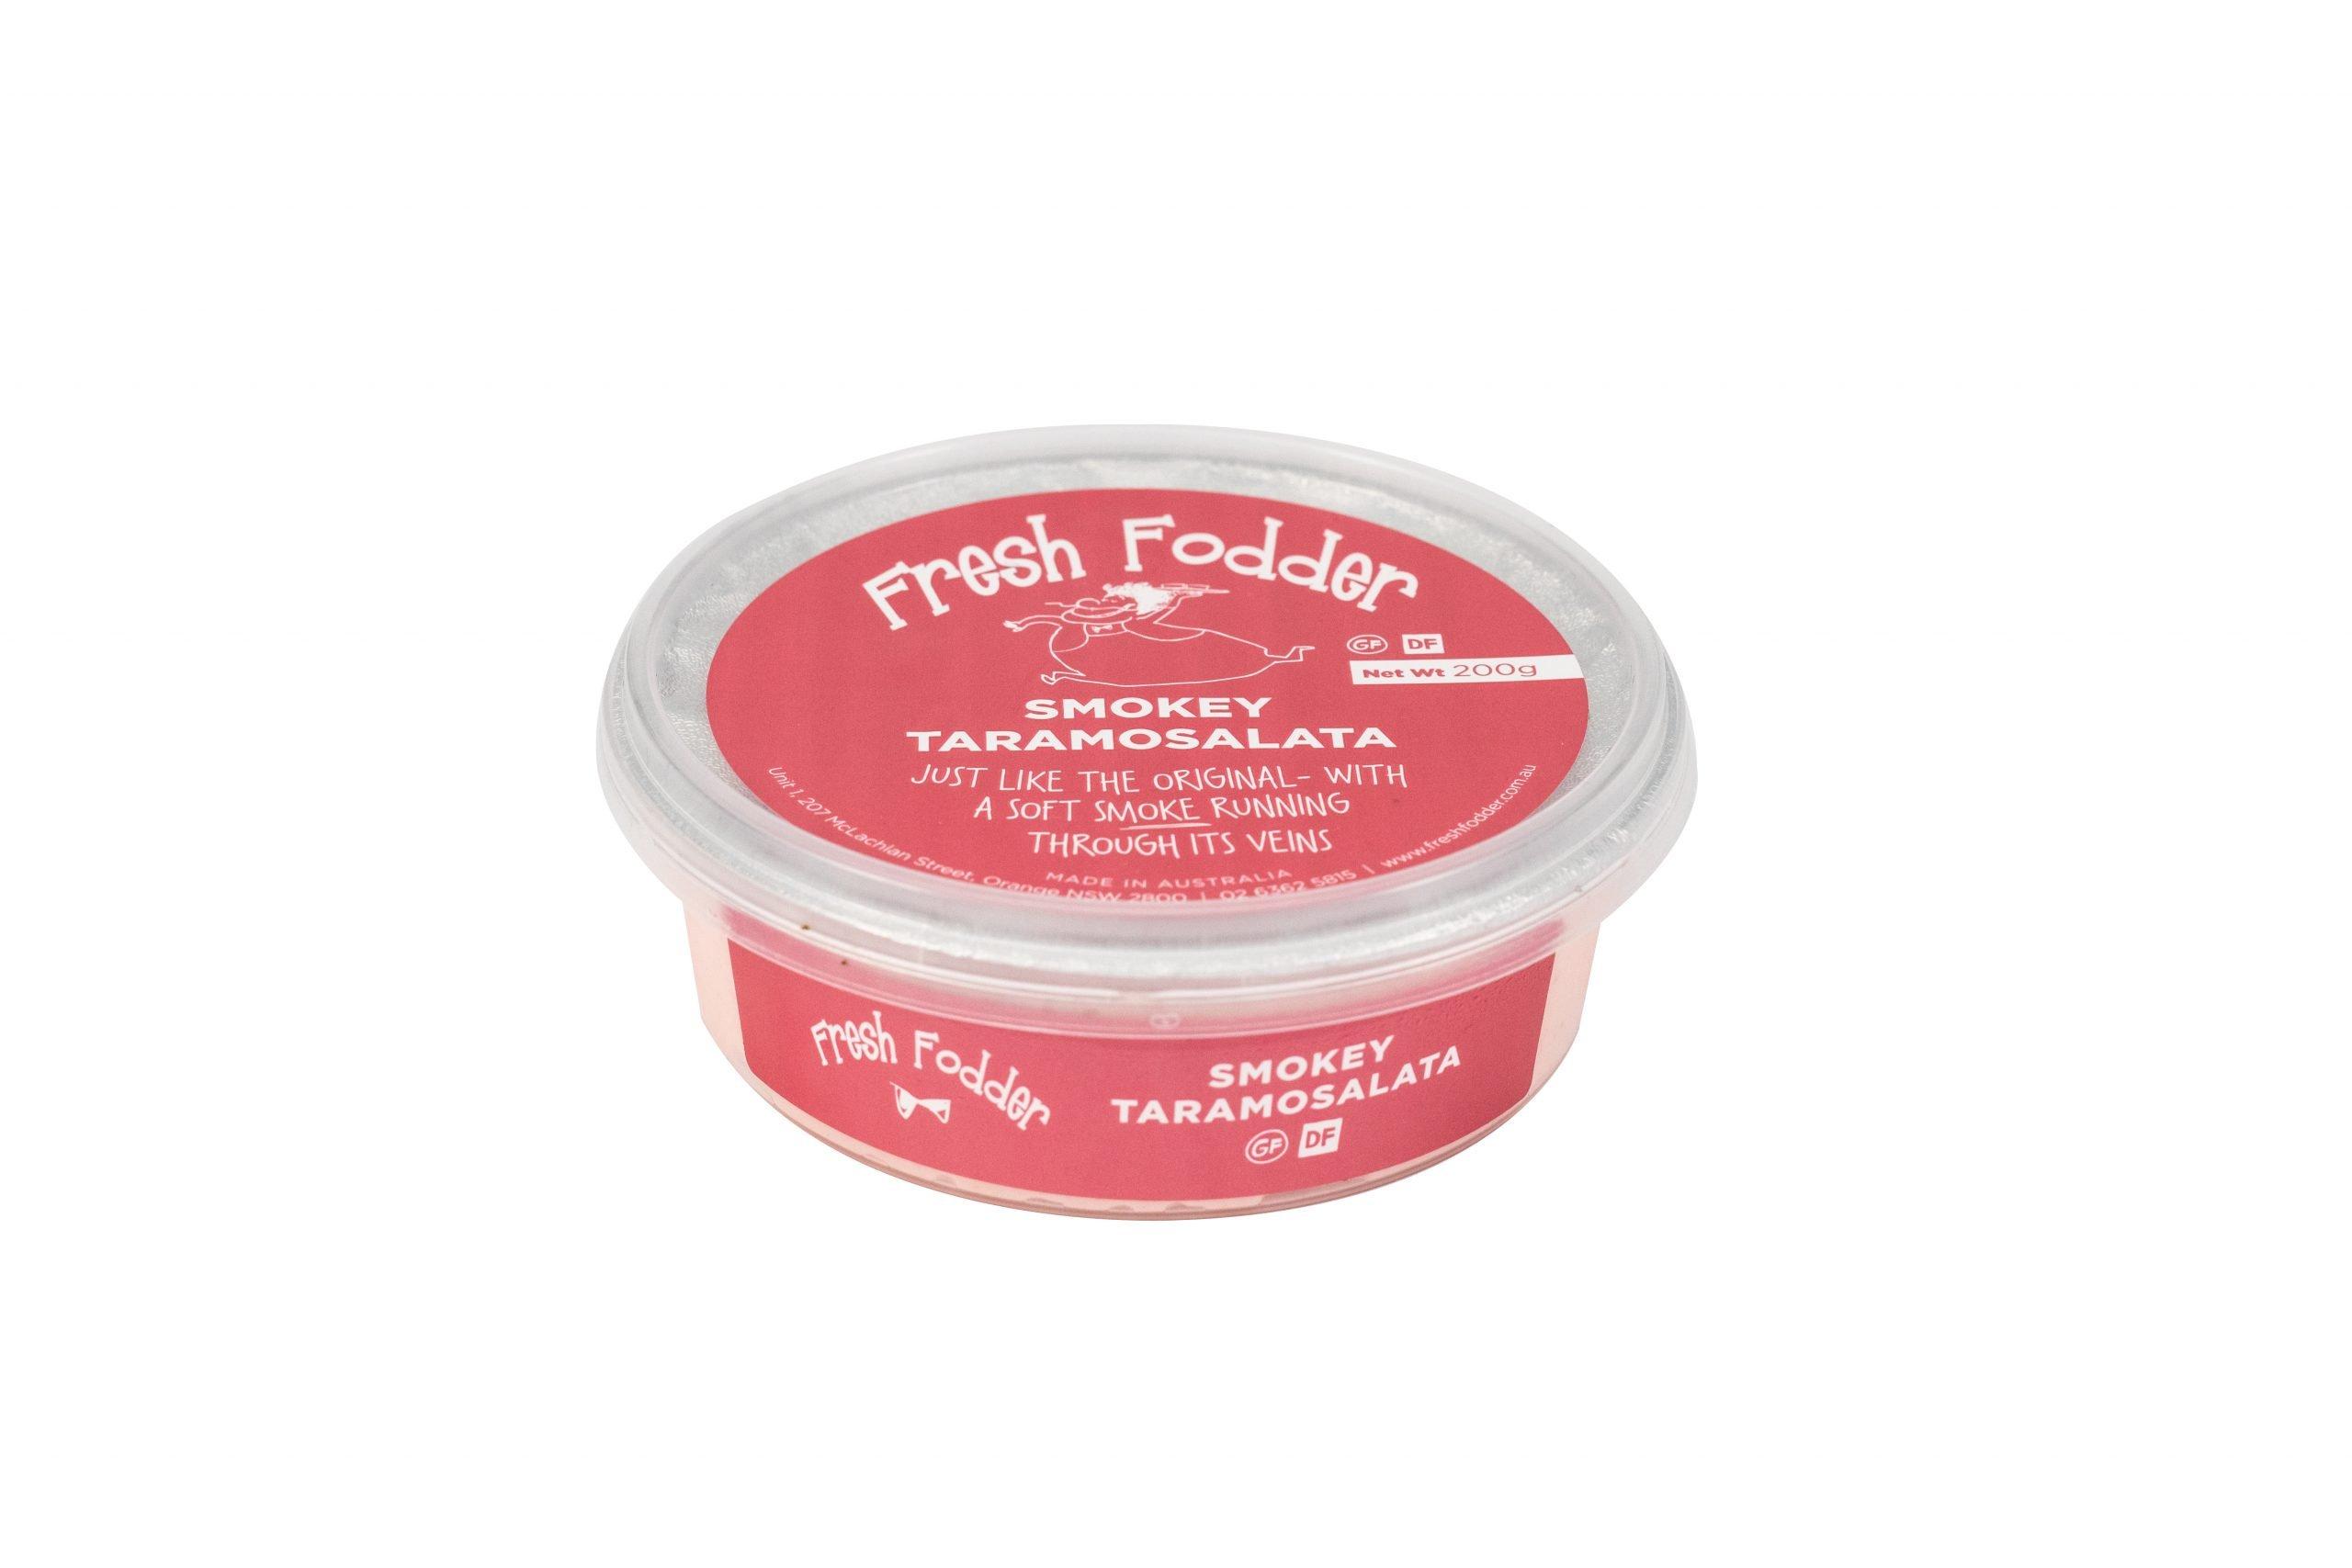 Fresh Fodder - Smokey Taramosalata - 200g